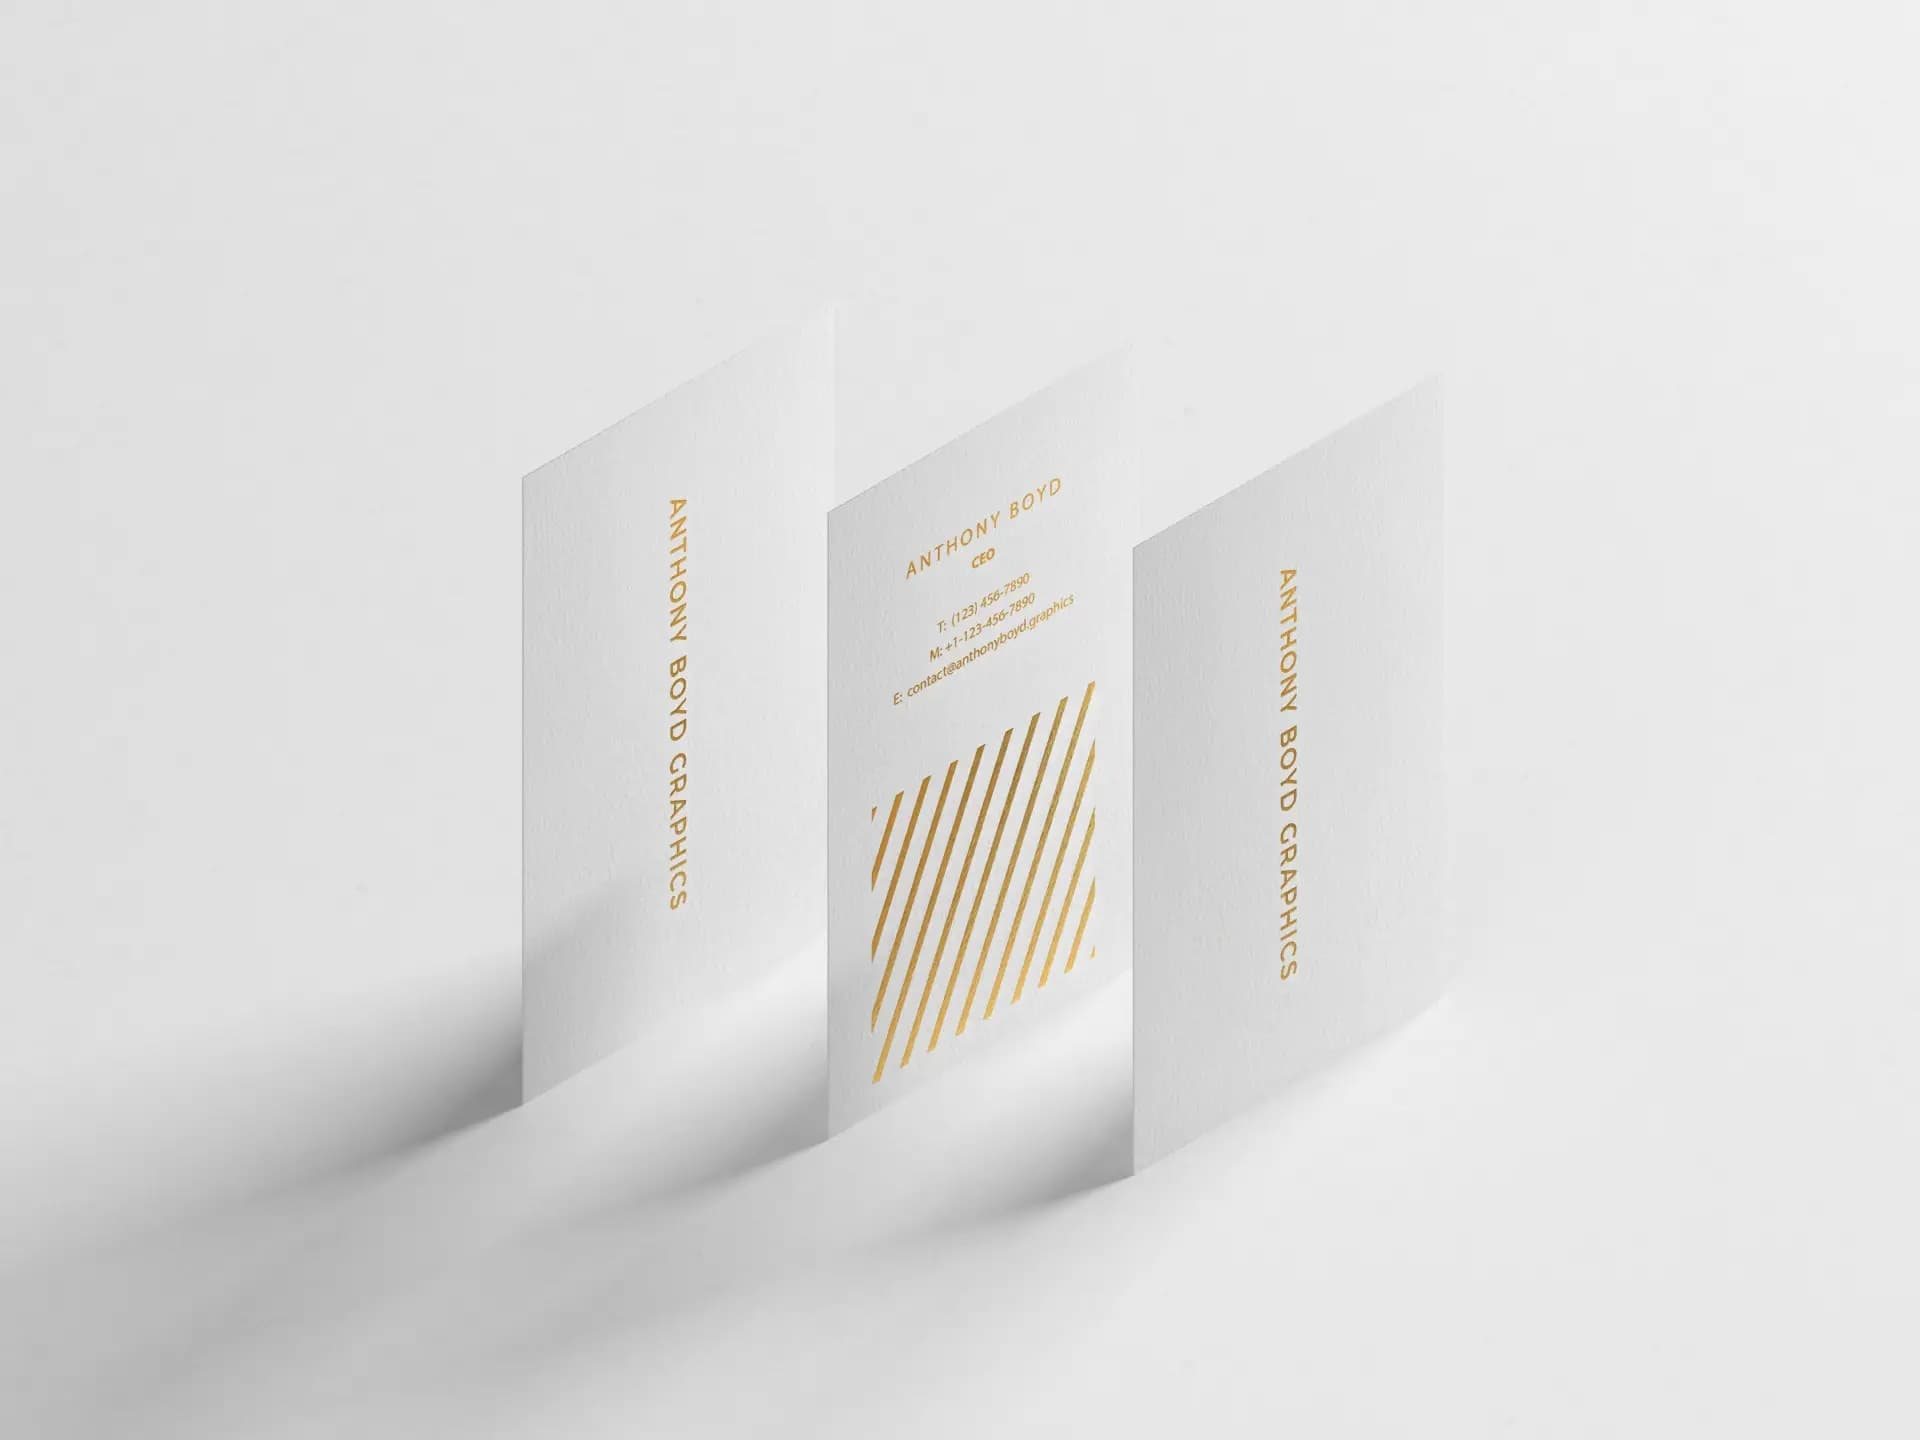 Free Modern Vertical Business Card PSD Mockup